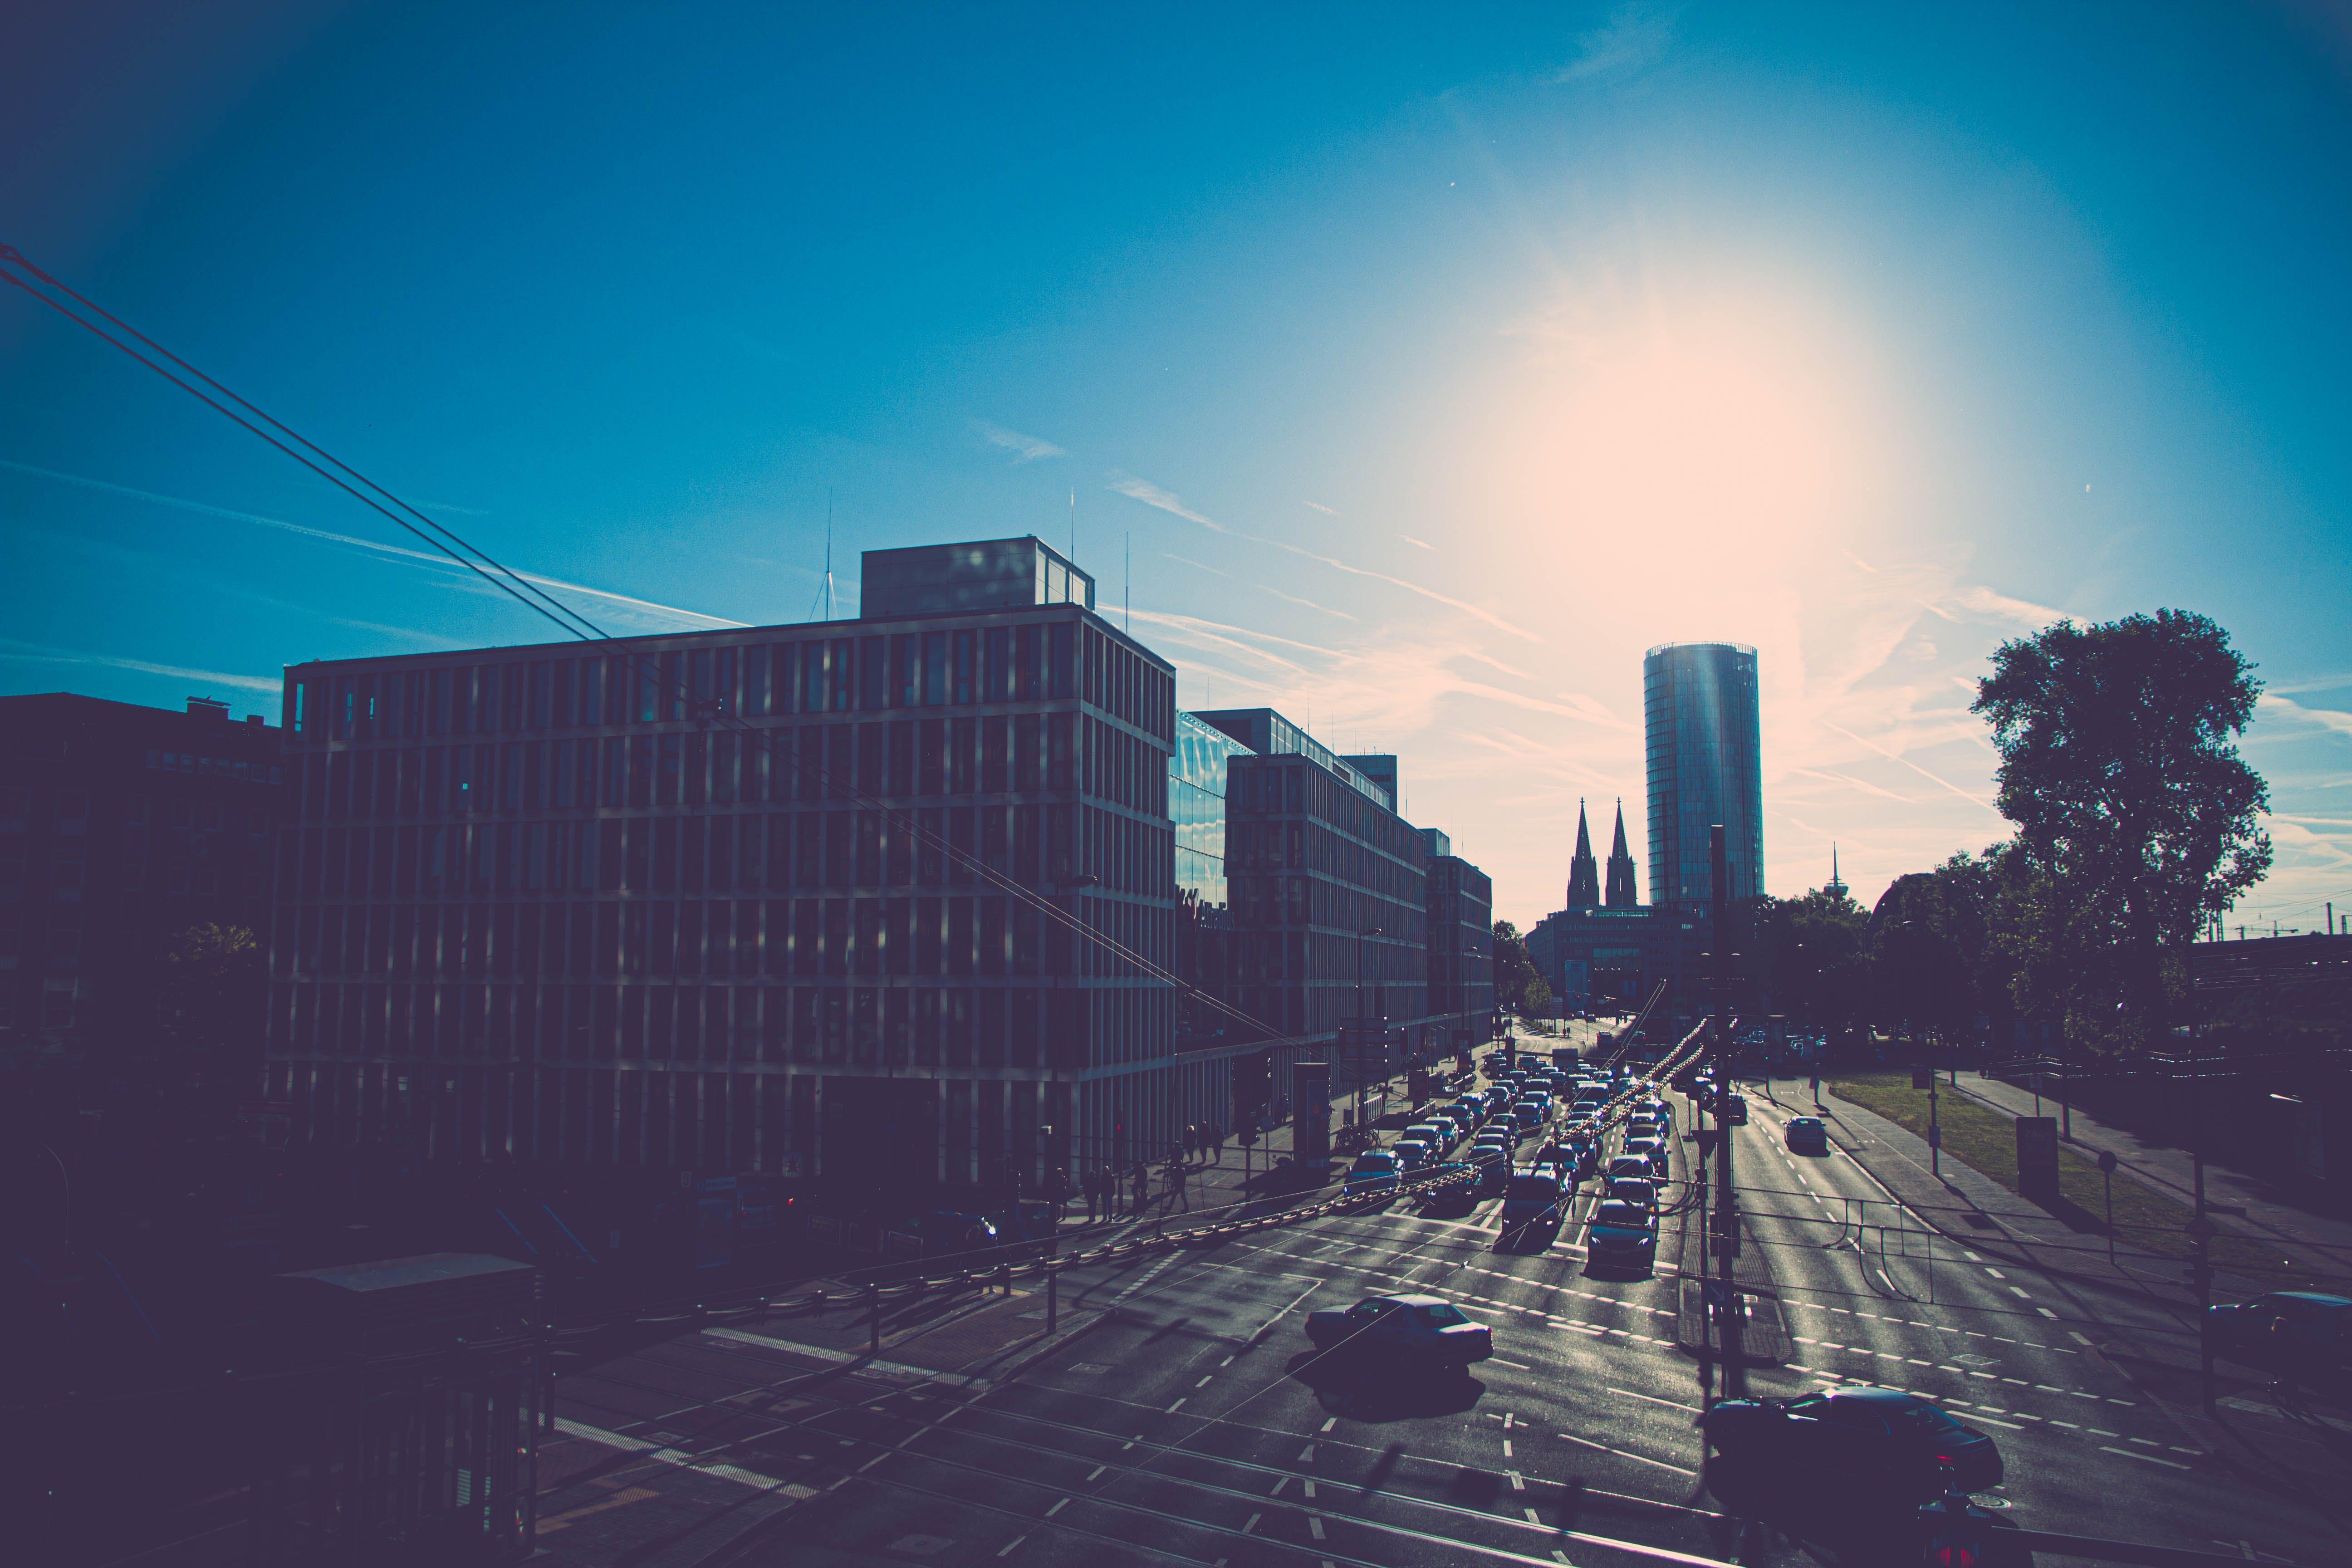 Kostenloses Stock Foto zu auto, blau, farbe, himmel